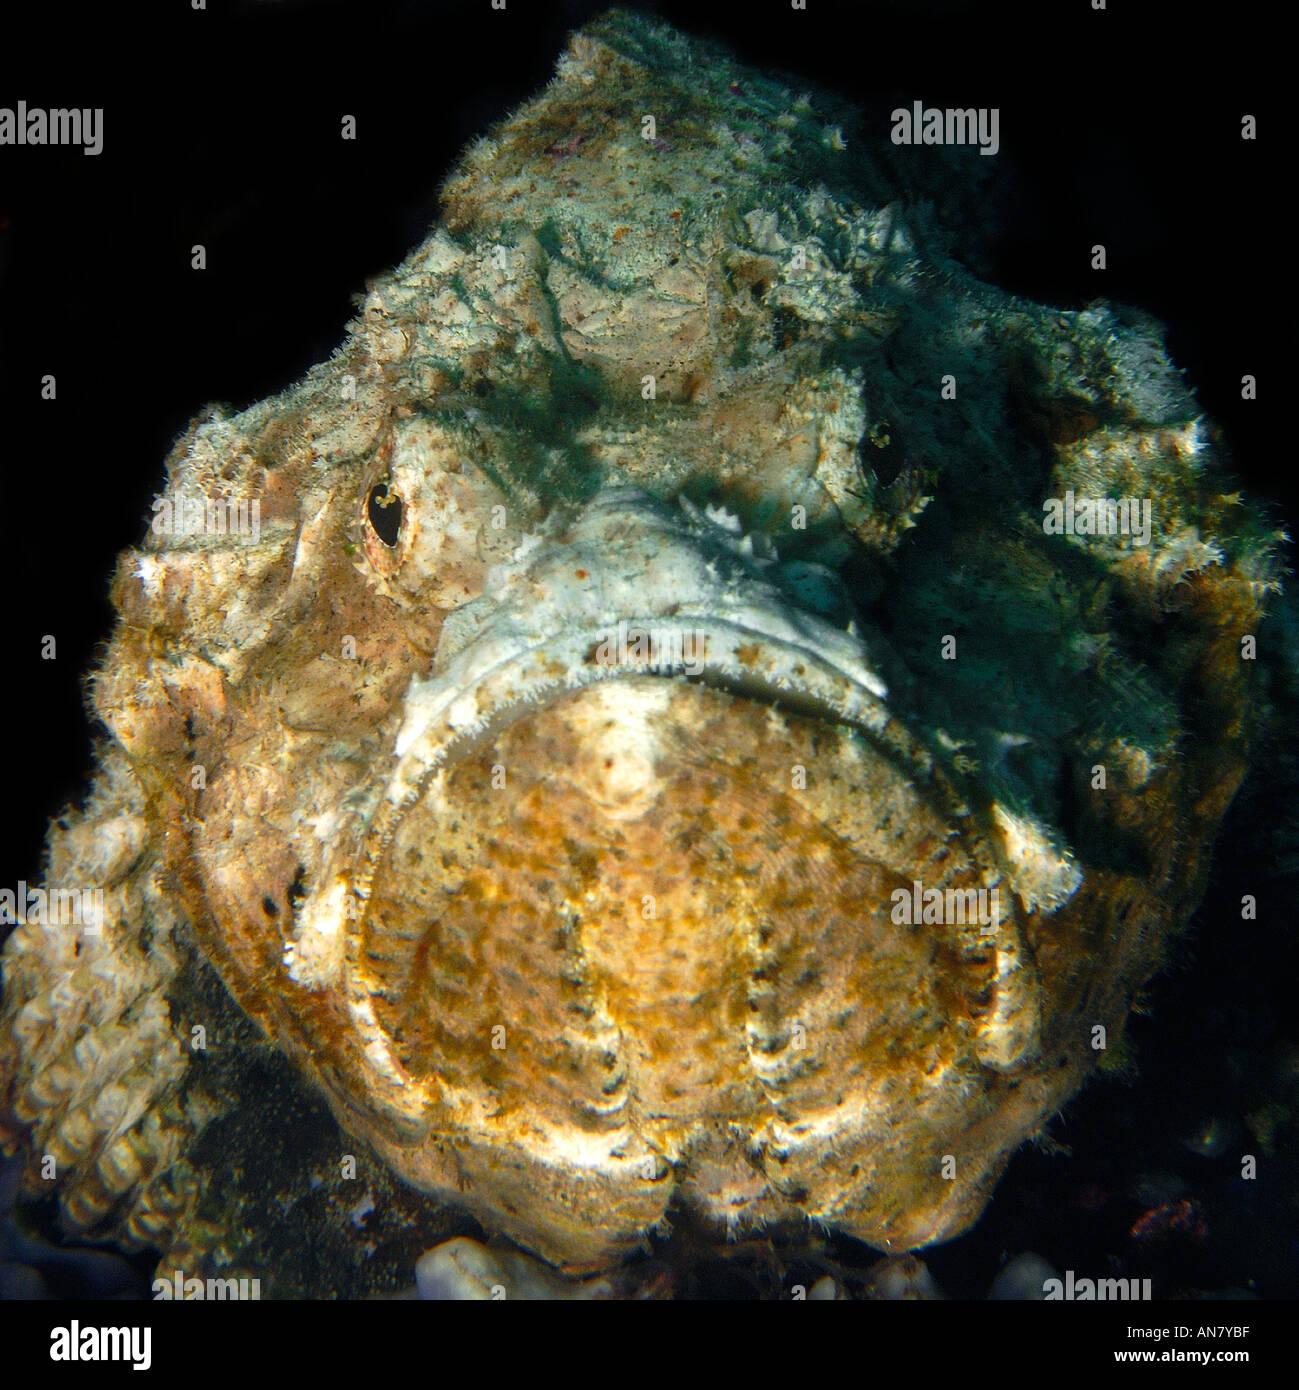 Devil scorpionfish Scorpaenopsis diabolus head detail Dauin Negros Philippines - Stock Image